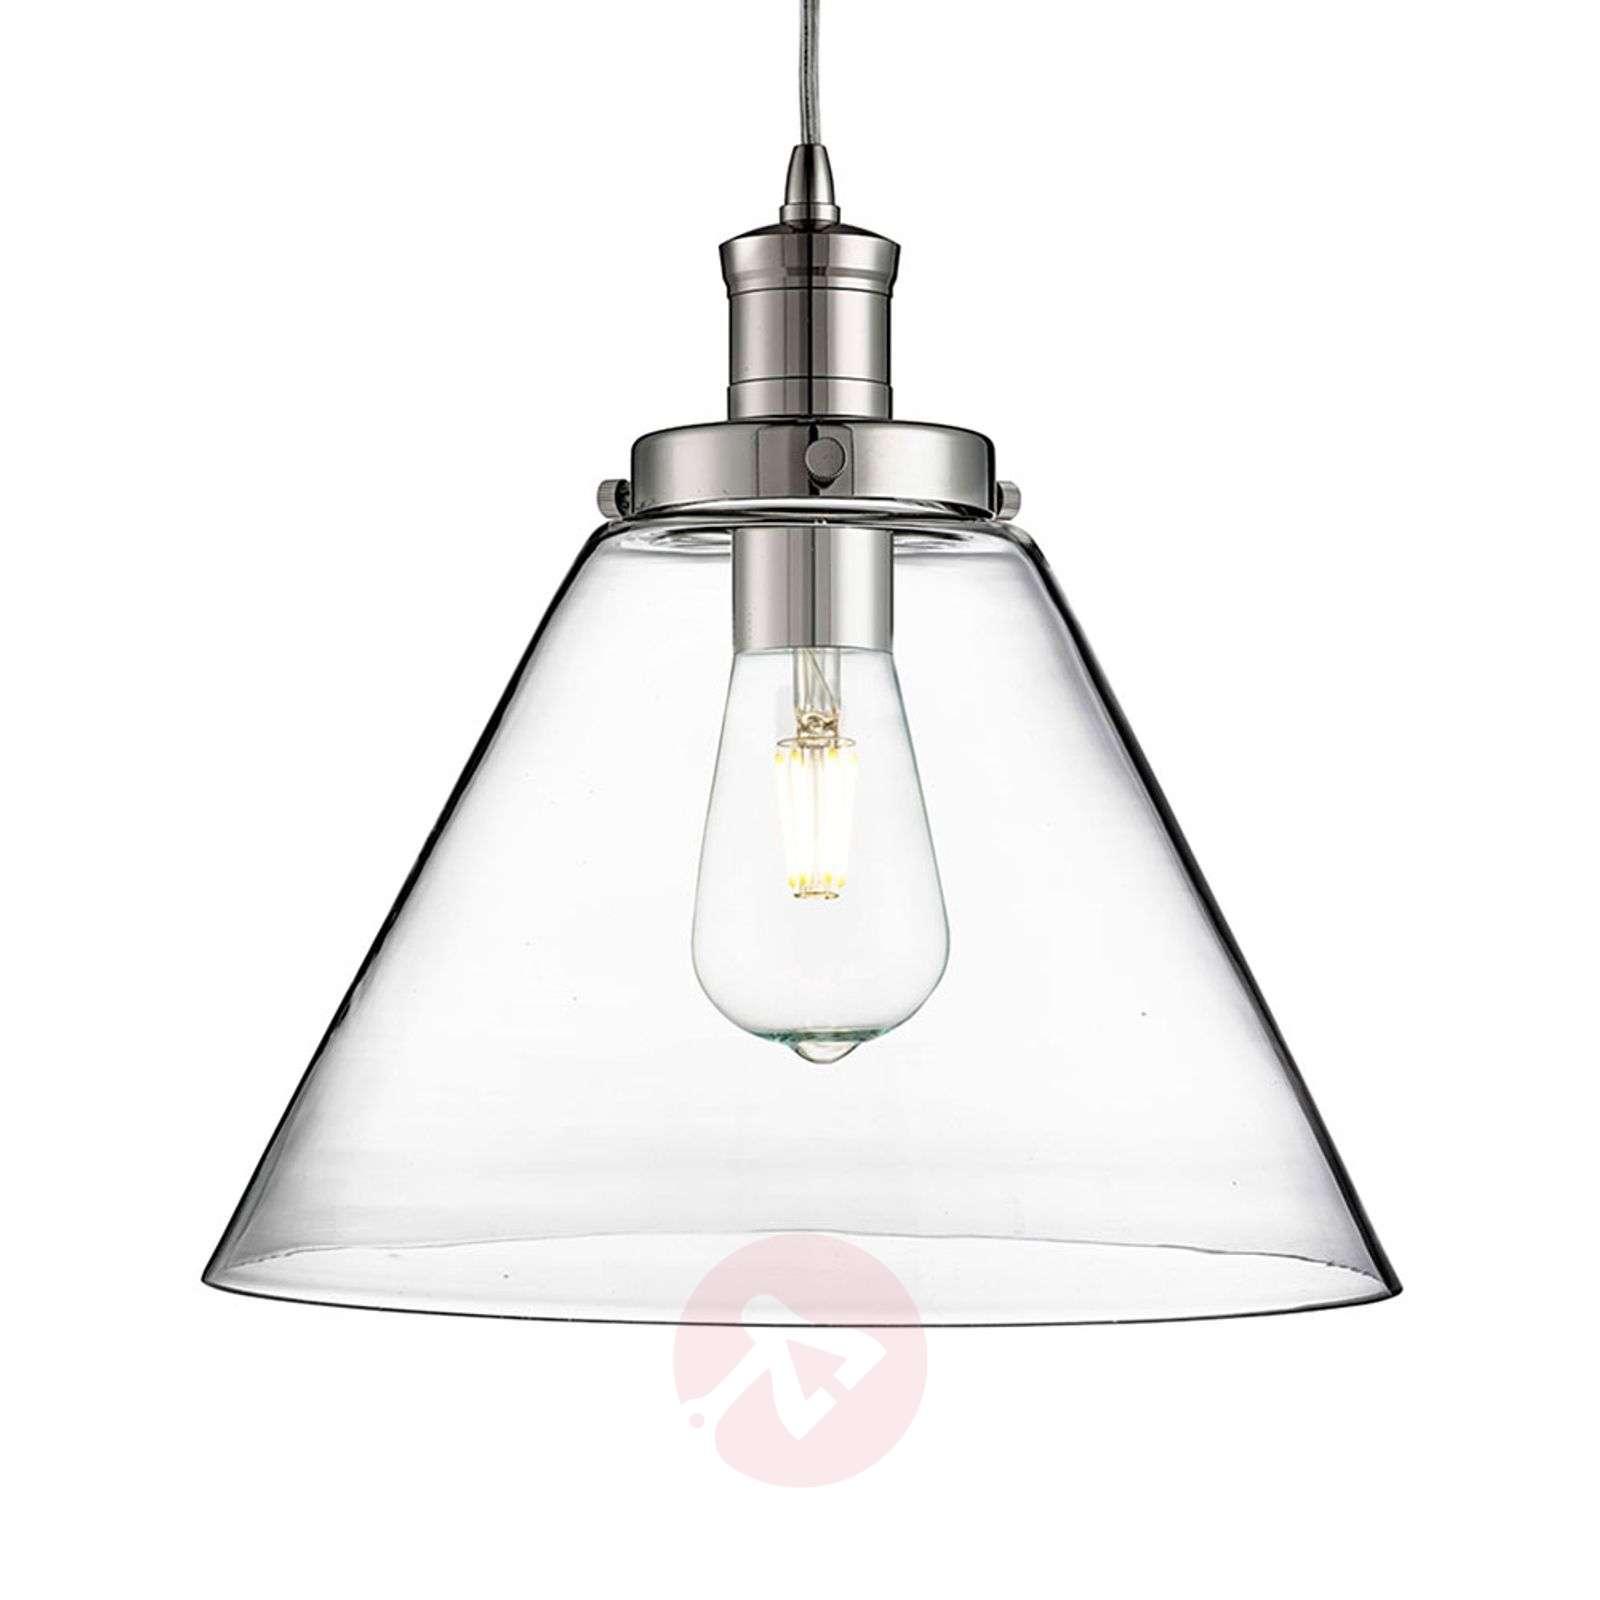 Modern glass pendant light Pyramid-8570997-01